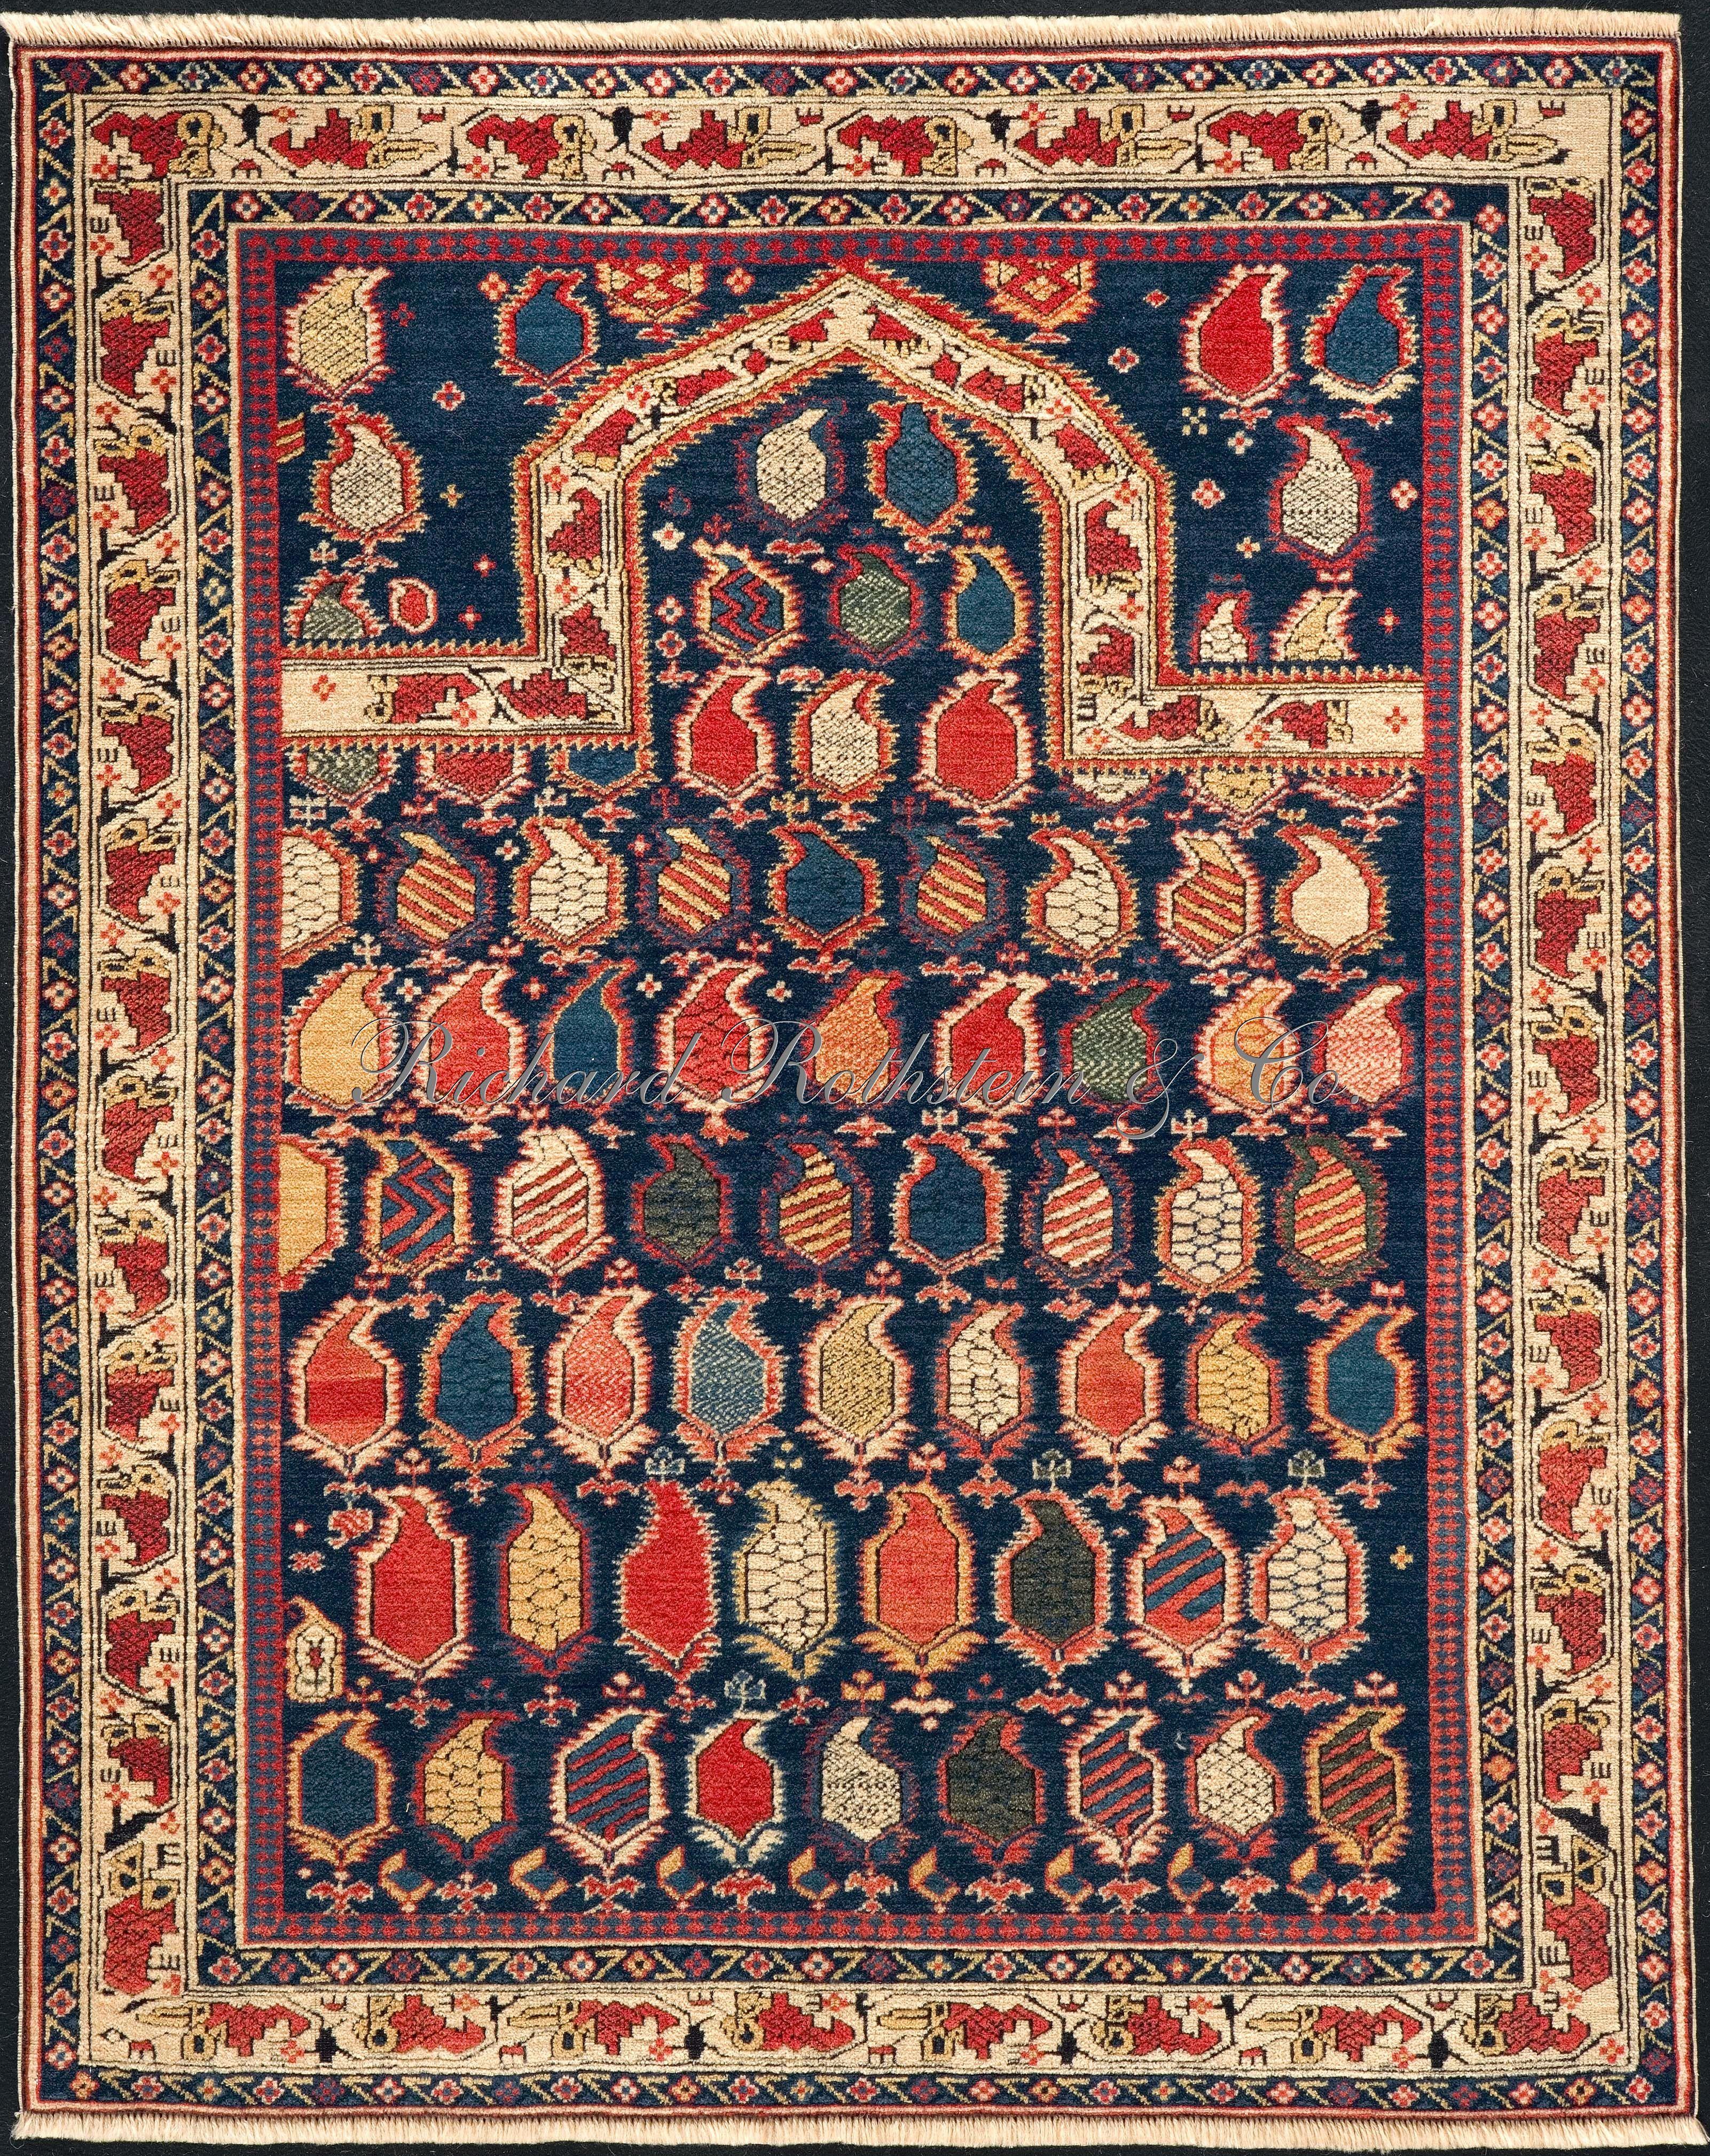 http://www.richardrothstein/shirvan-marasali-prayer-rug